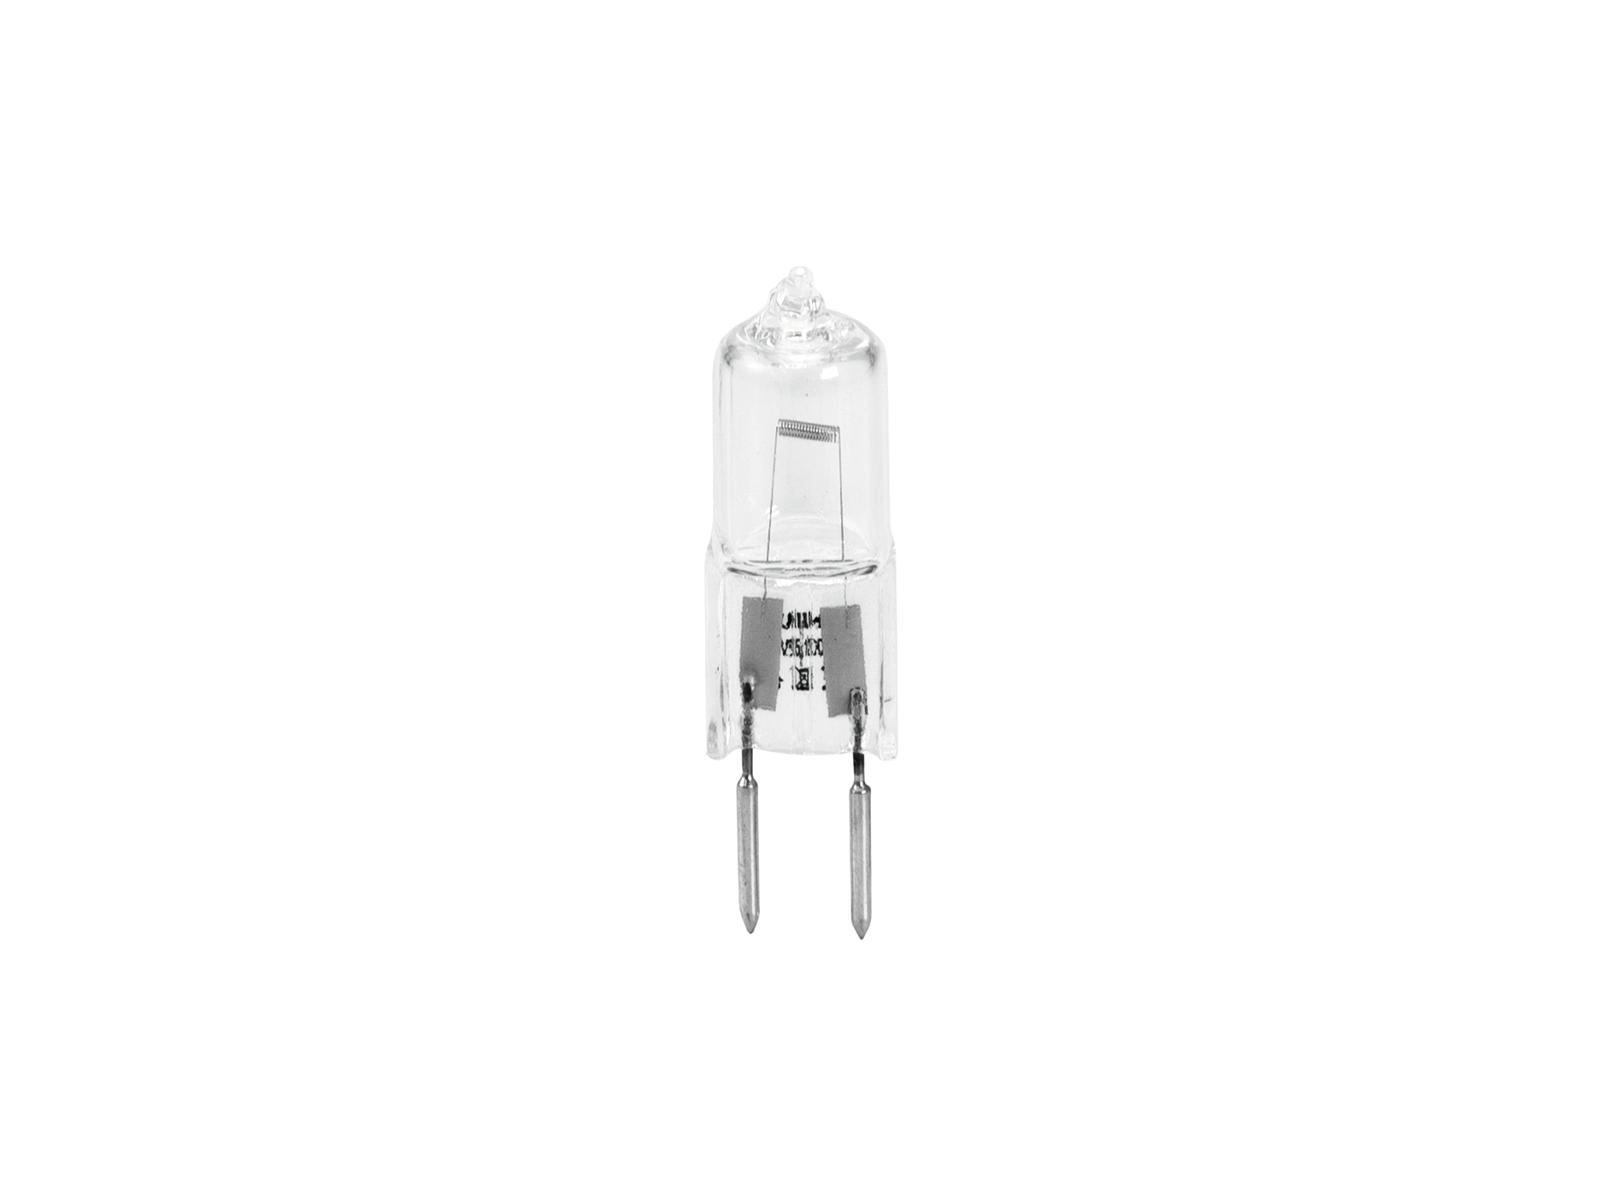 OMNILUX FCR 12V/100W G-6.35 2000h 2900K